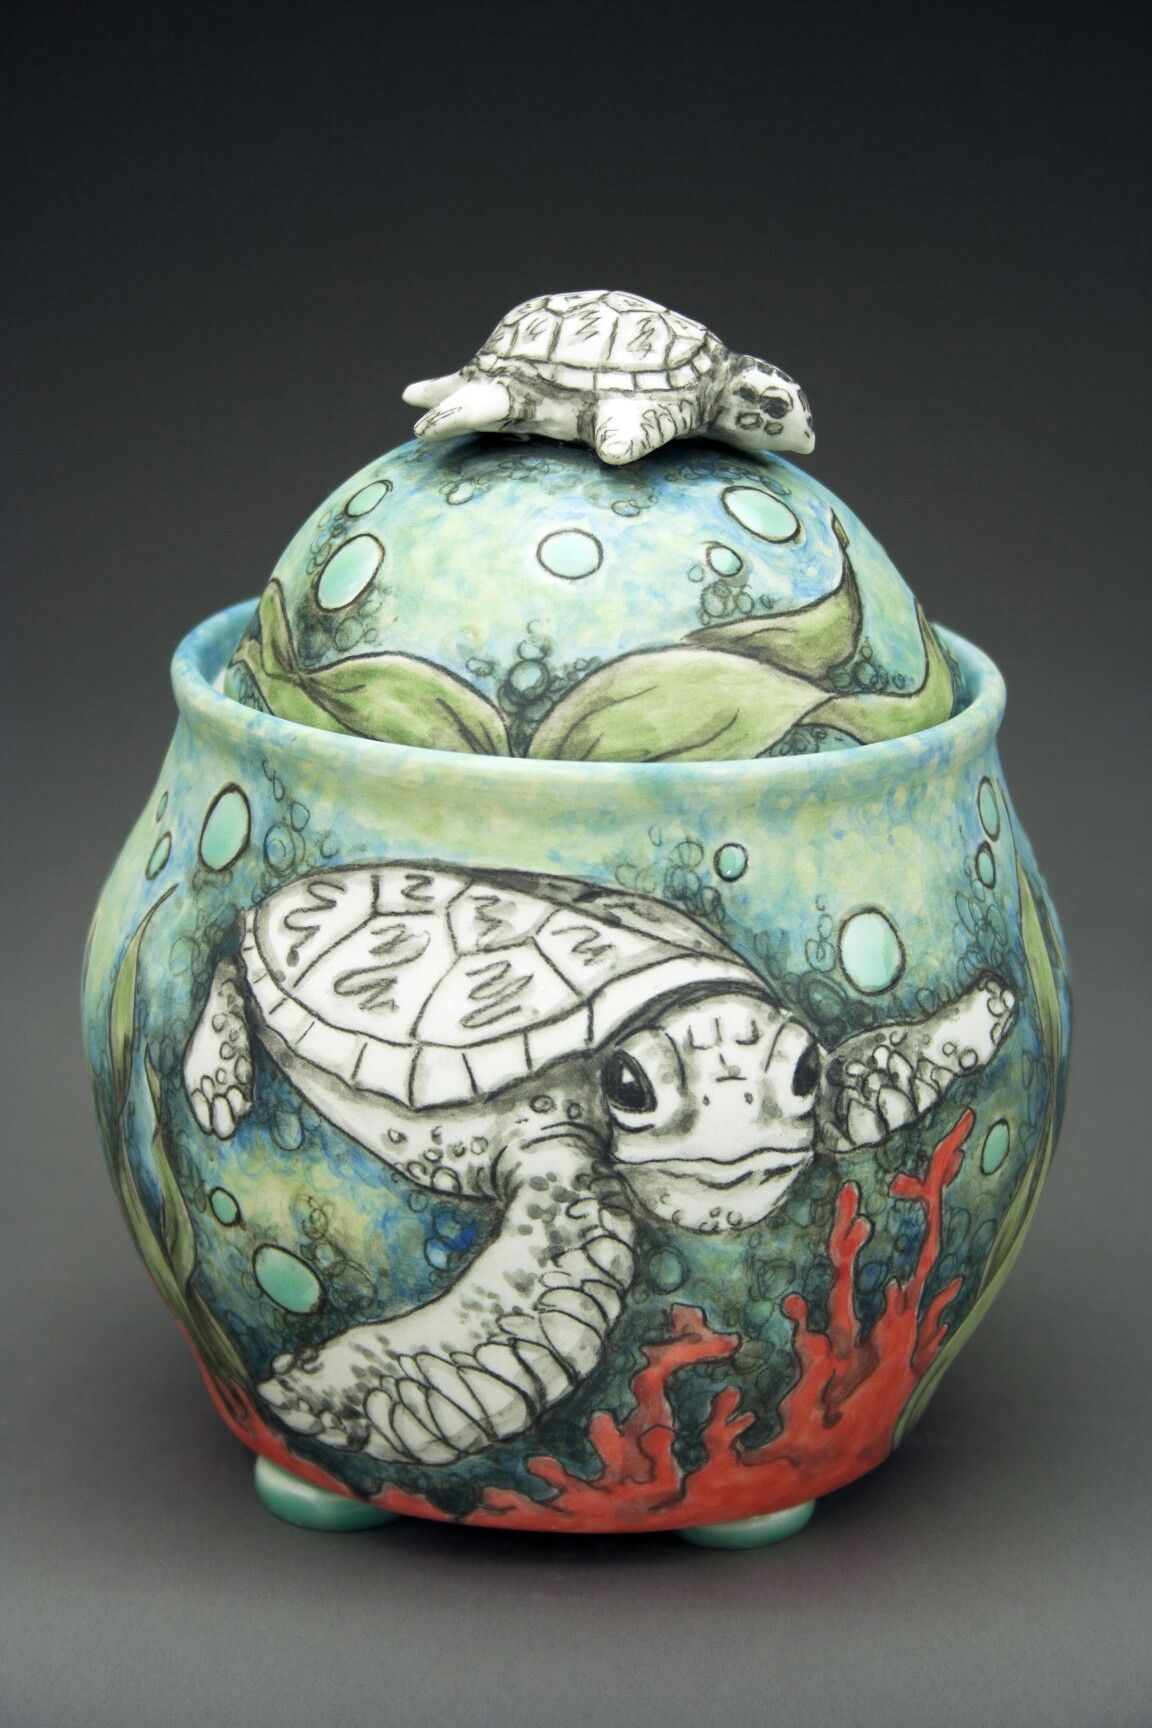 Turtle Jar By Cj Niehaus Solo Show Charliecummingsgallery Com Ceramics Ceramic Techniques Pottery